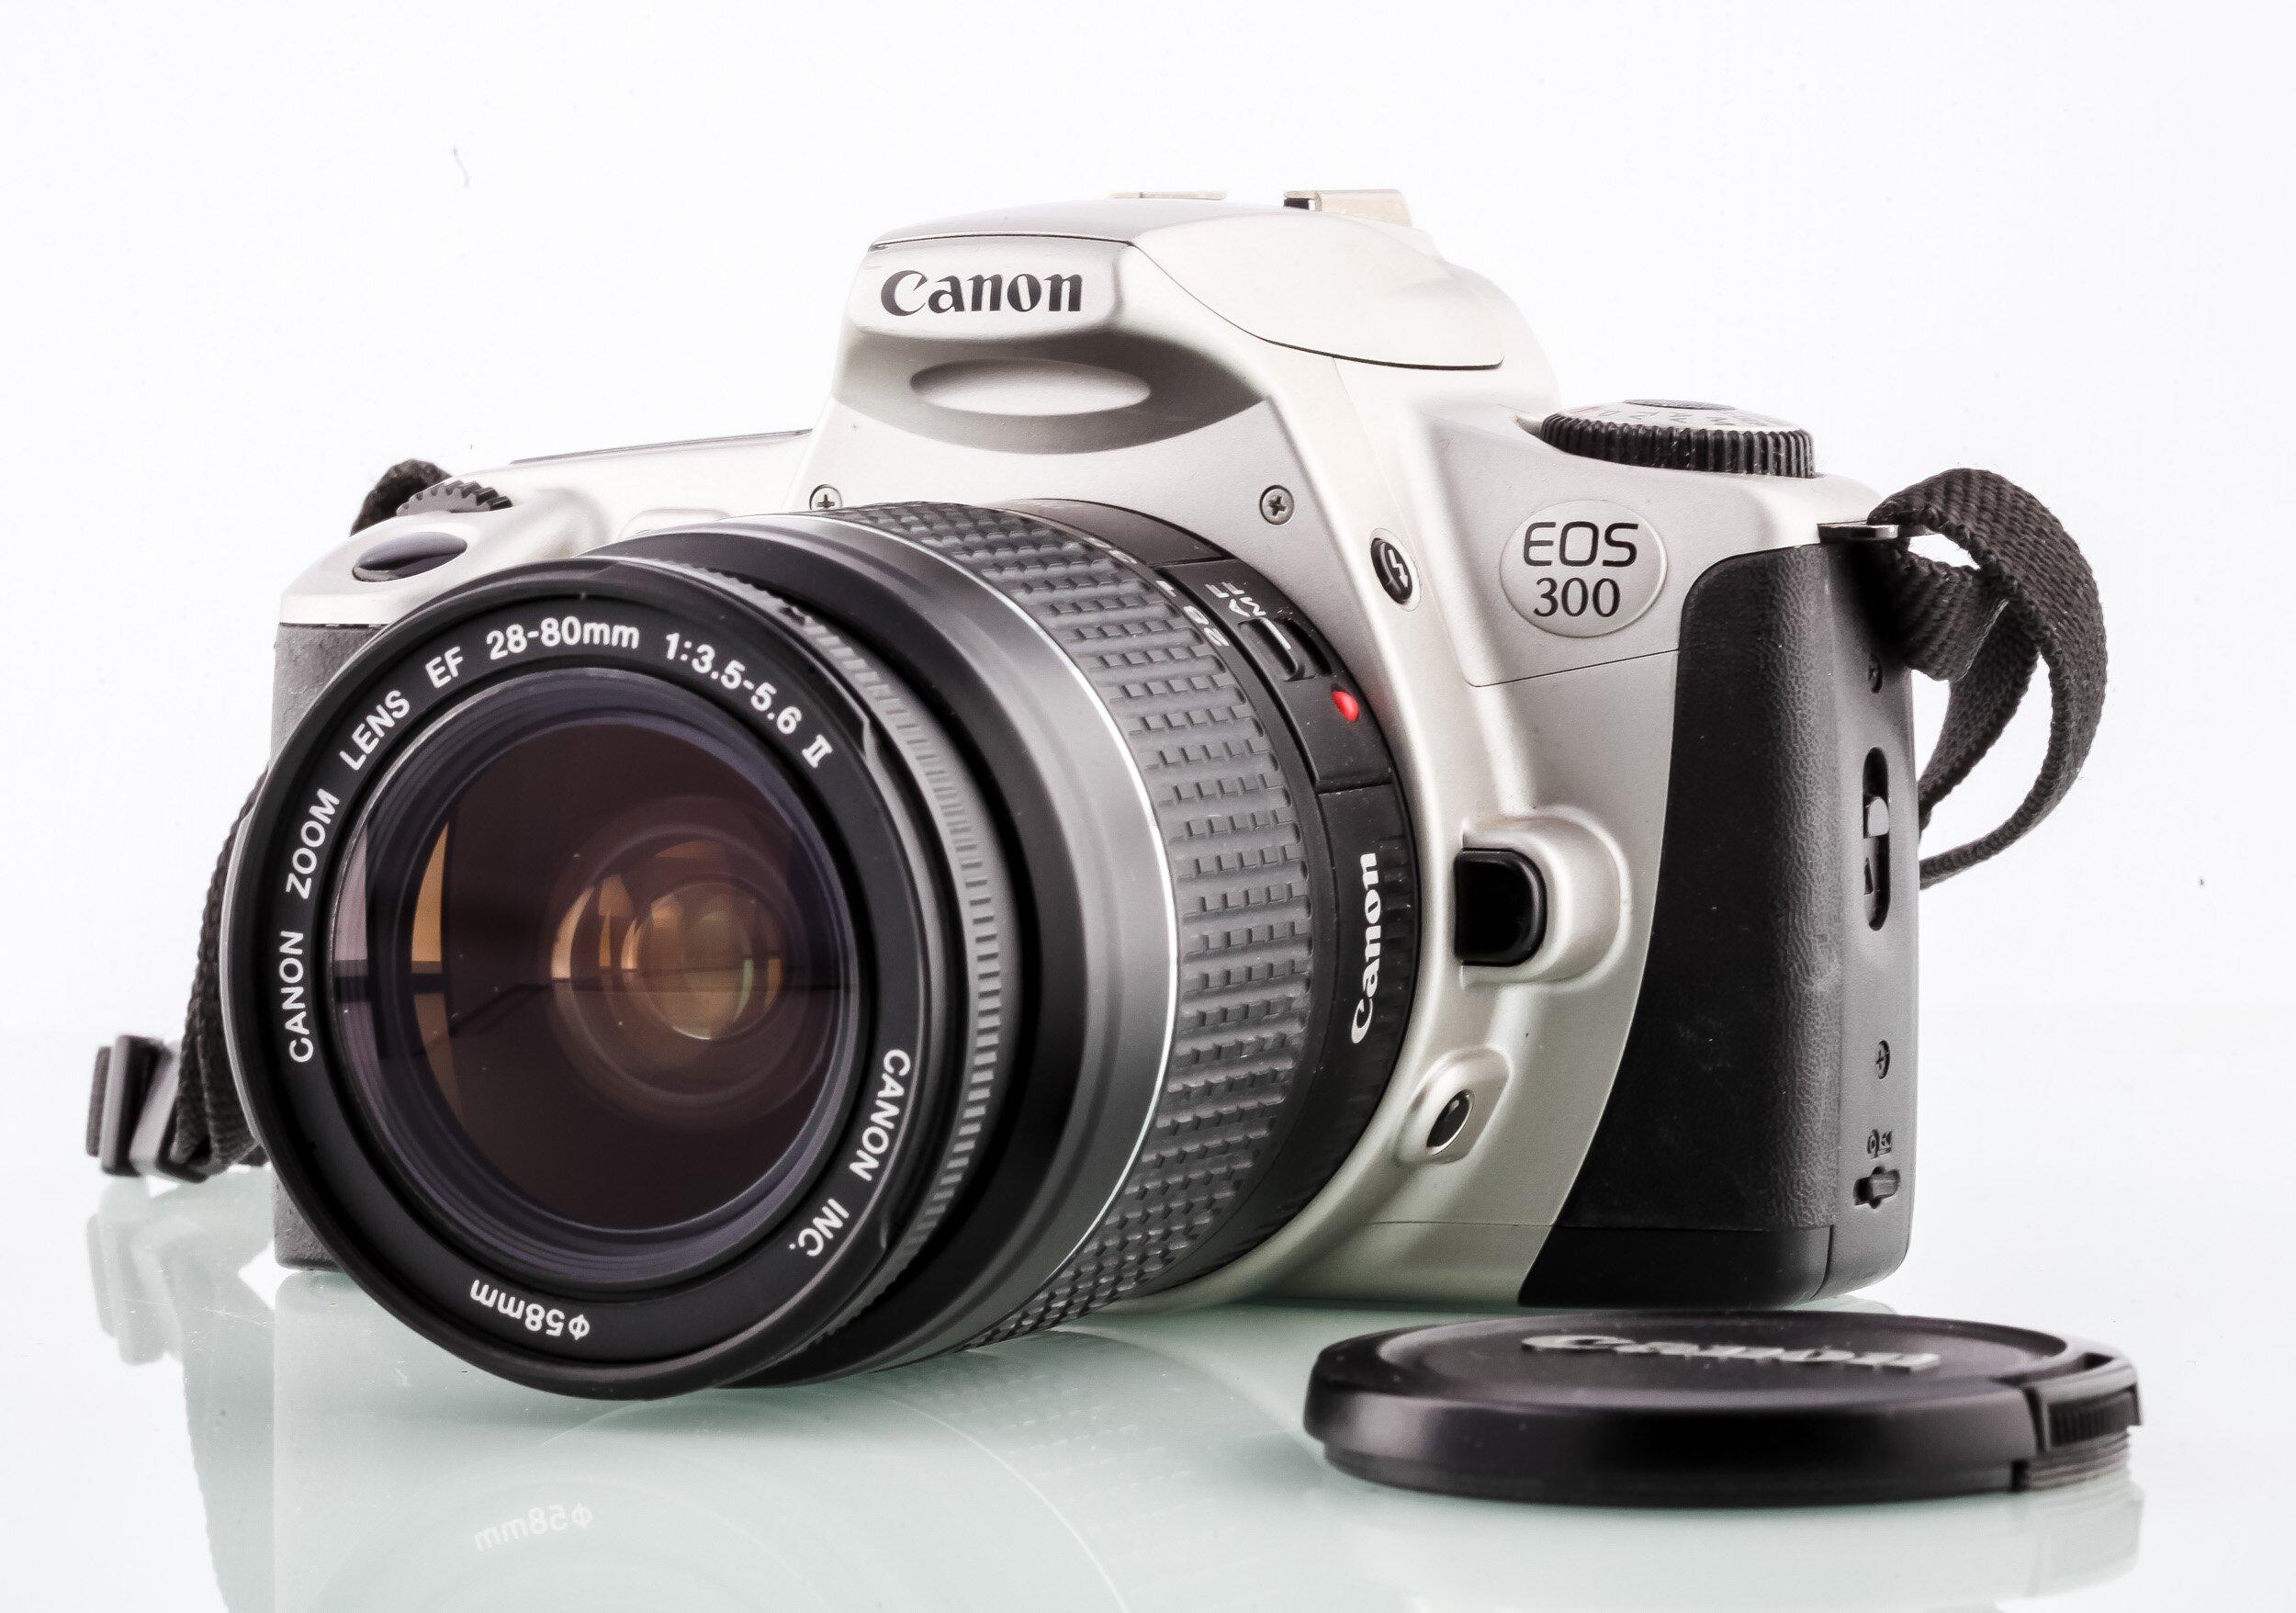 Canon EOS 300-Canon 28-80mm Analoge SLR Kamera